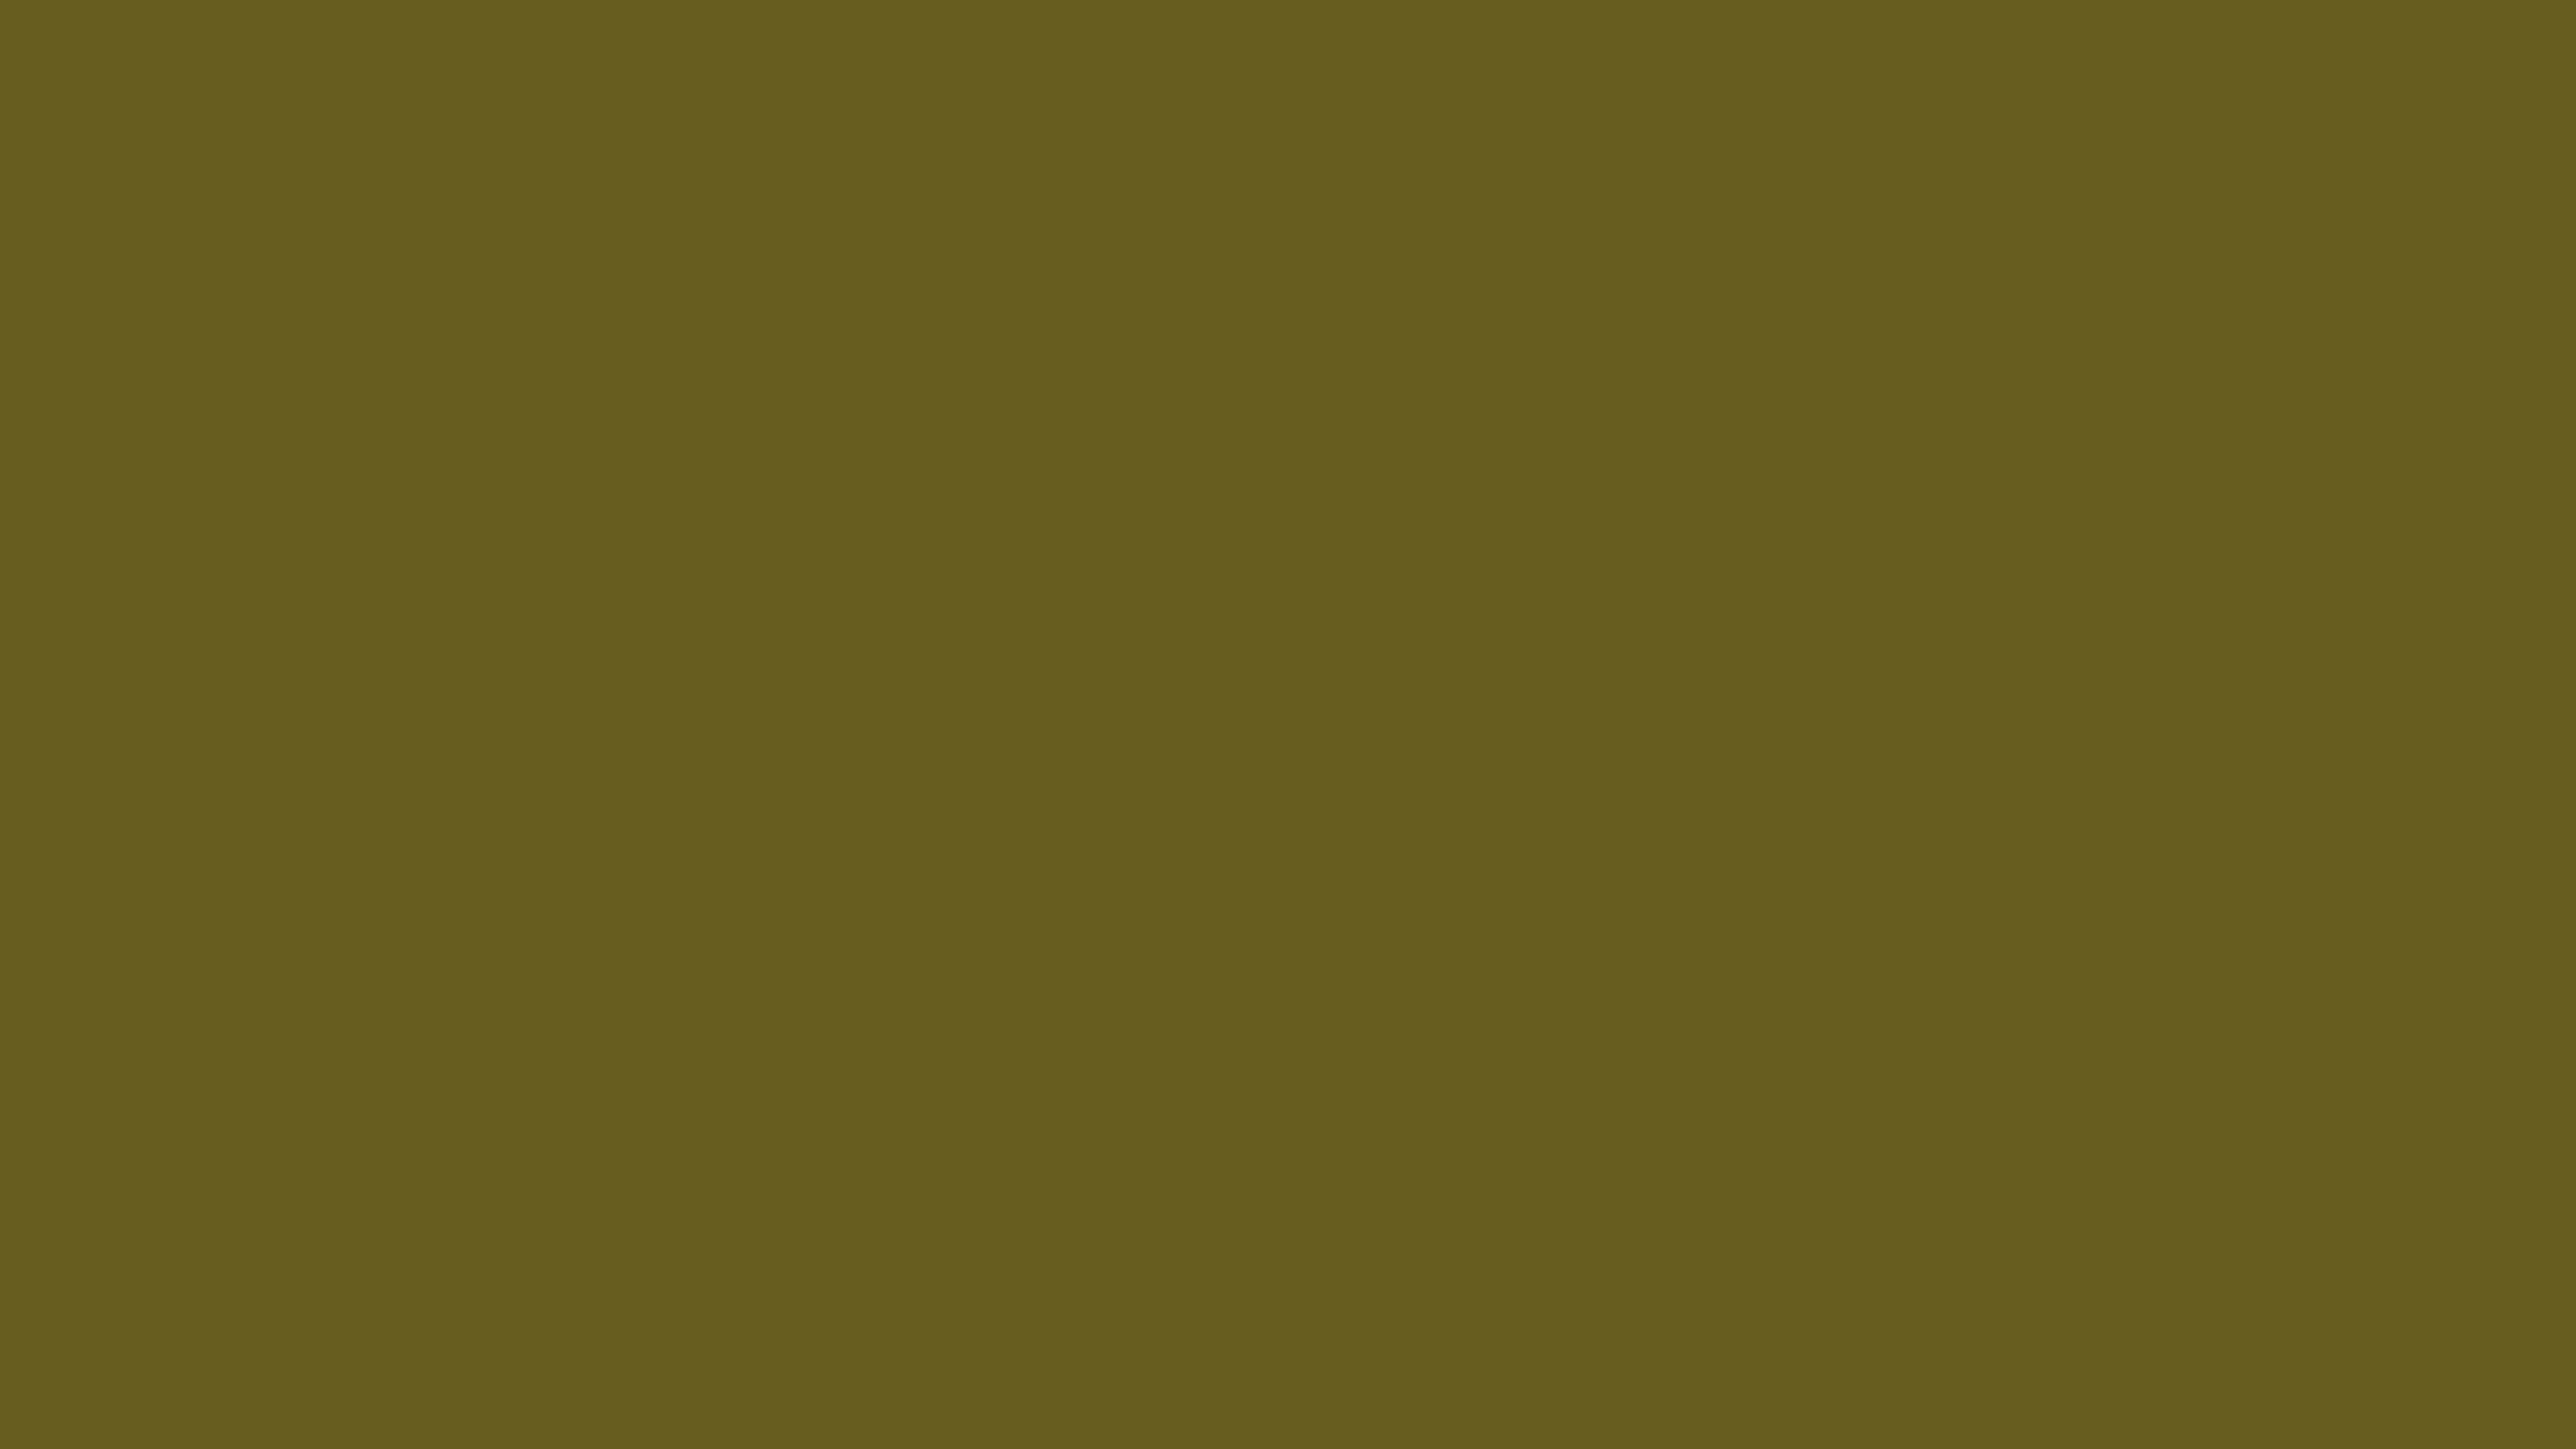 4096x2304 Antique Bronze Solid Color Background